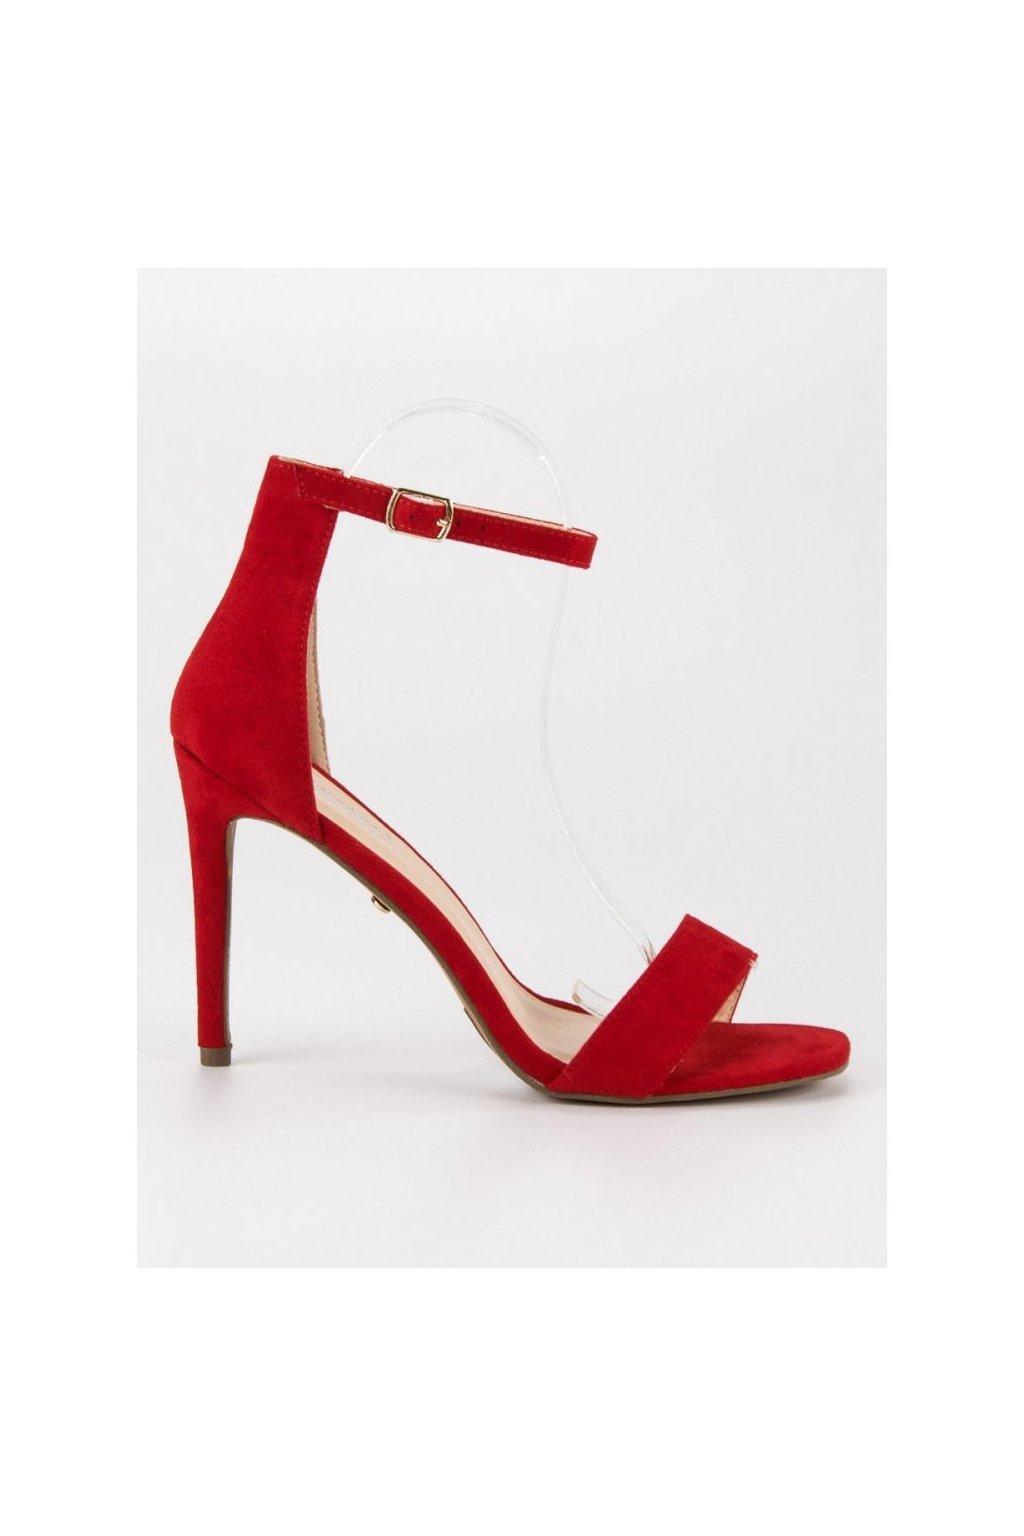 semisove sandale na podpatku sy31r (2)